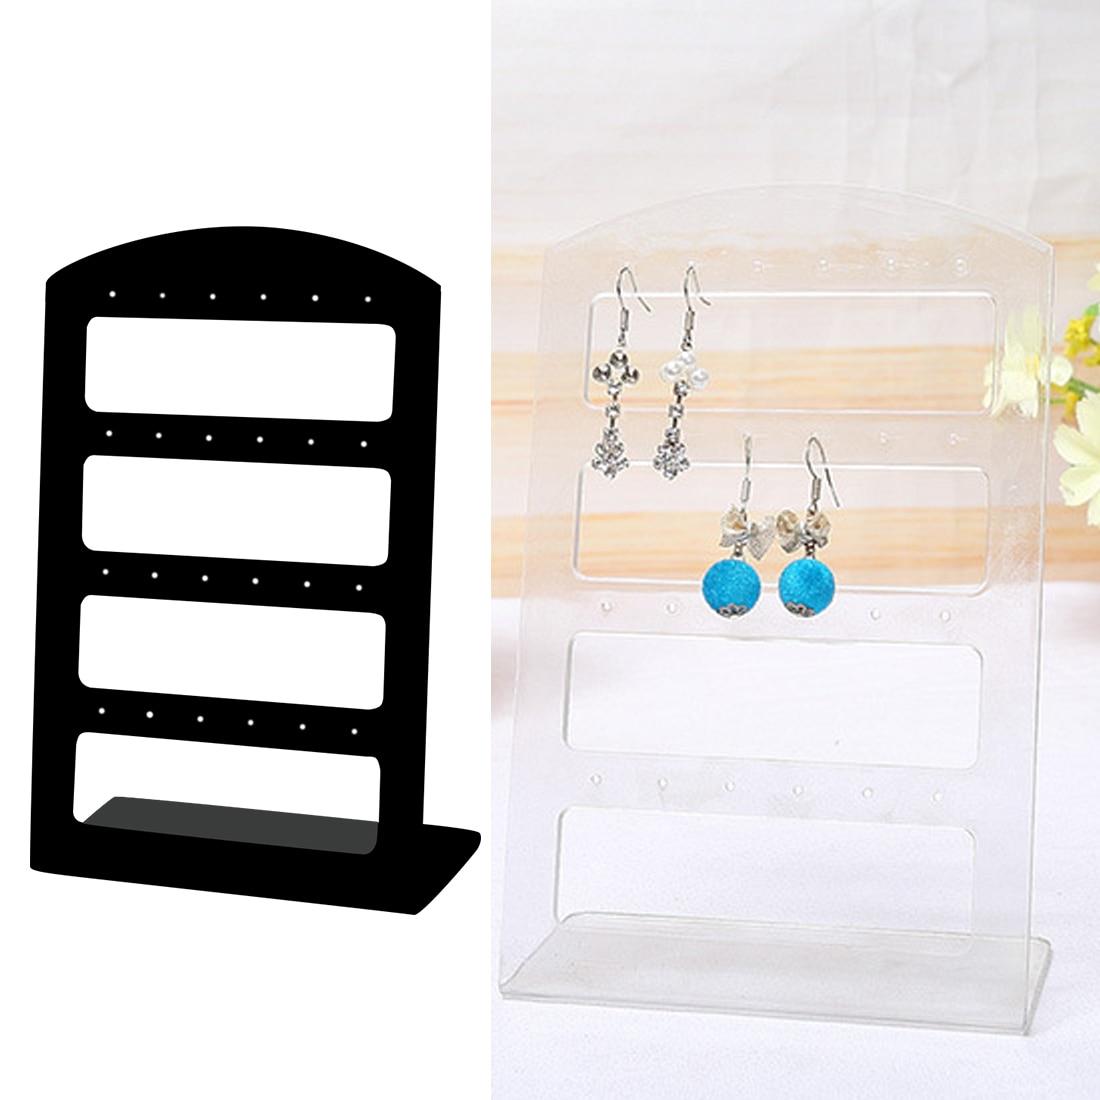 24 Holes Jewelry Organizer Stand Black Plastic Earring Holder Fashion Earrings Display Rack